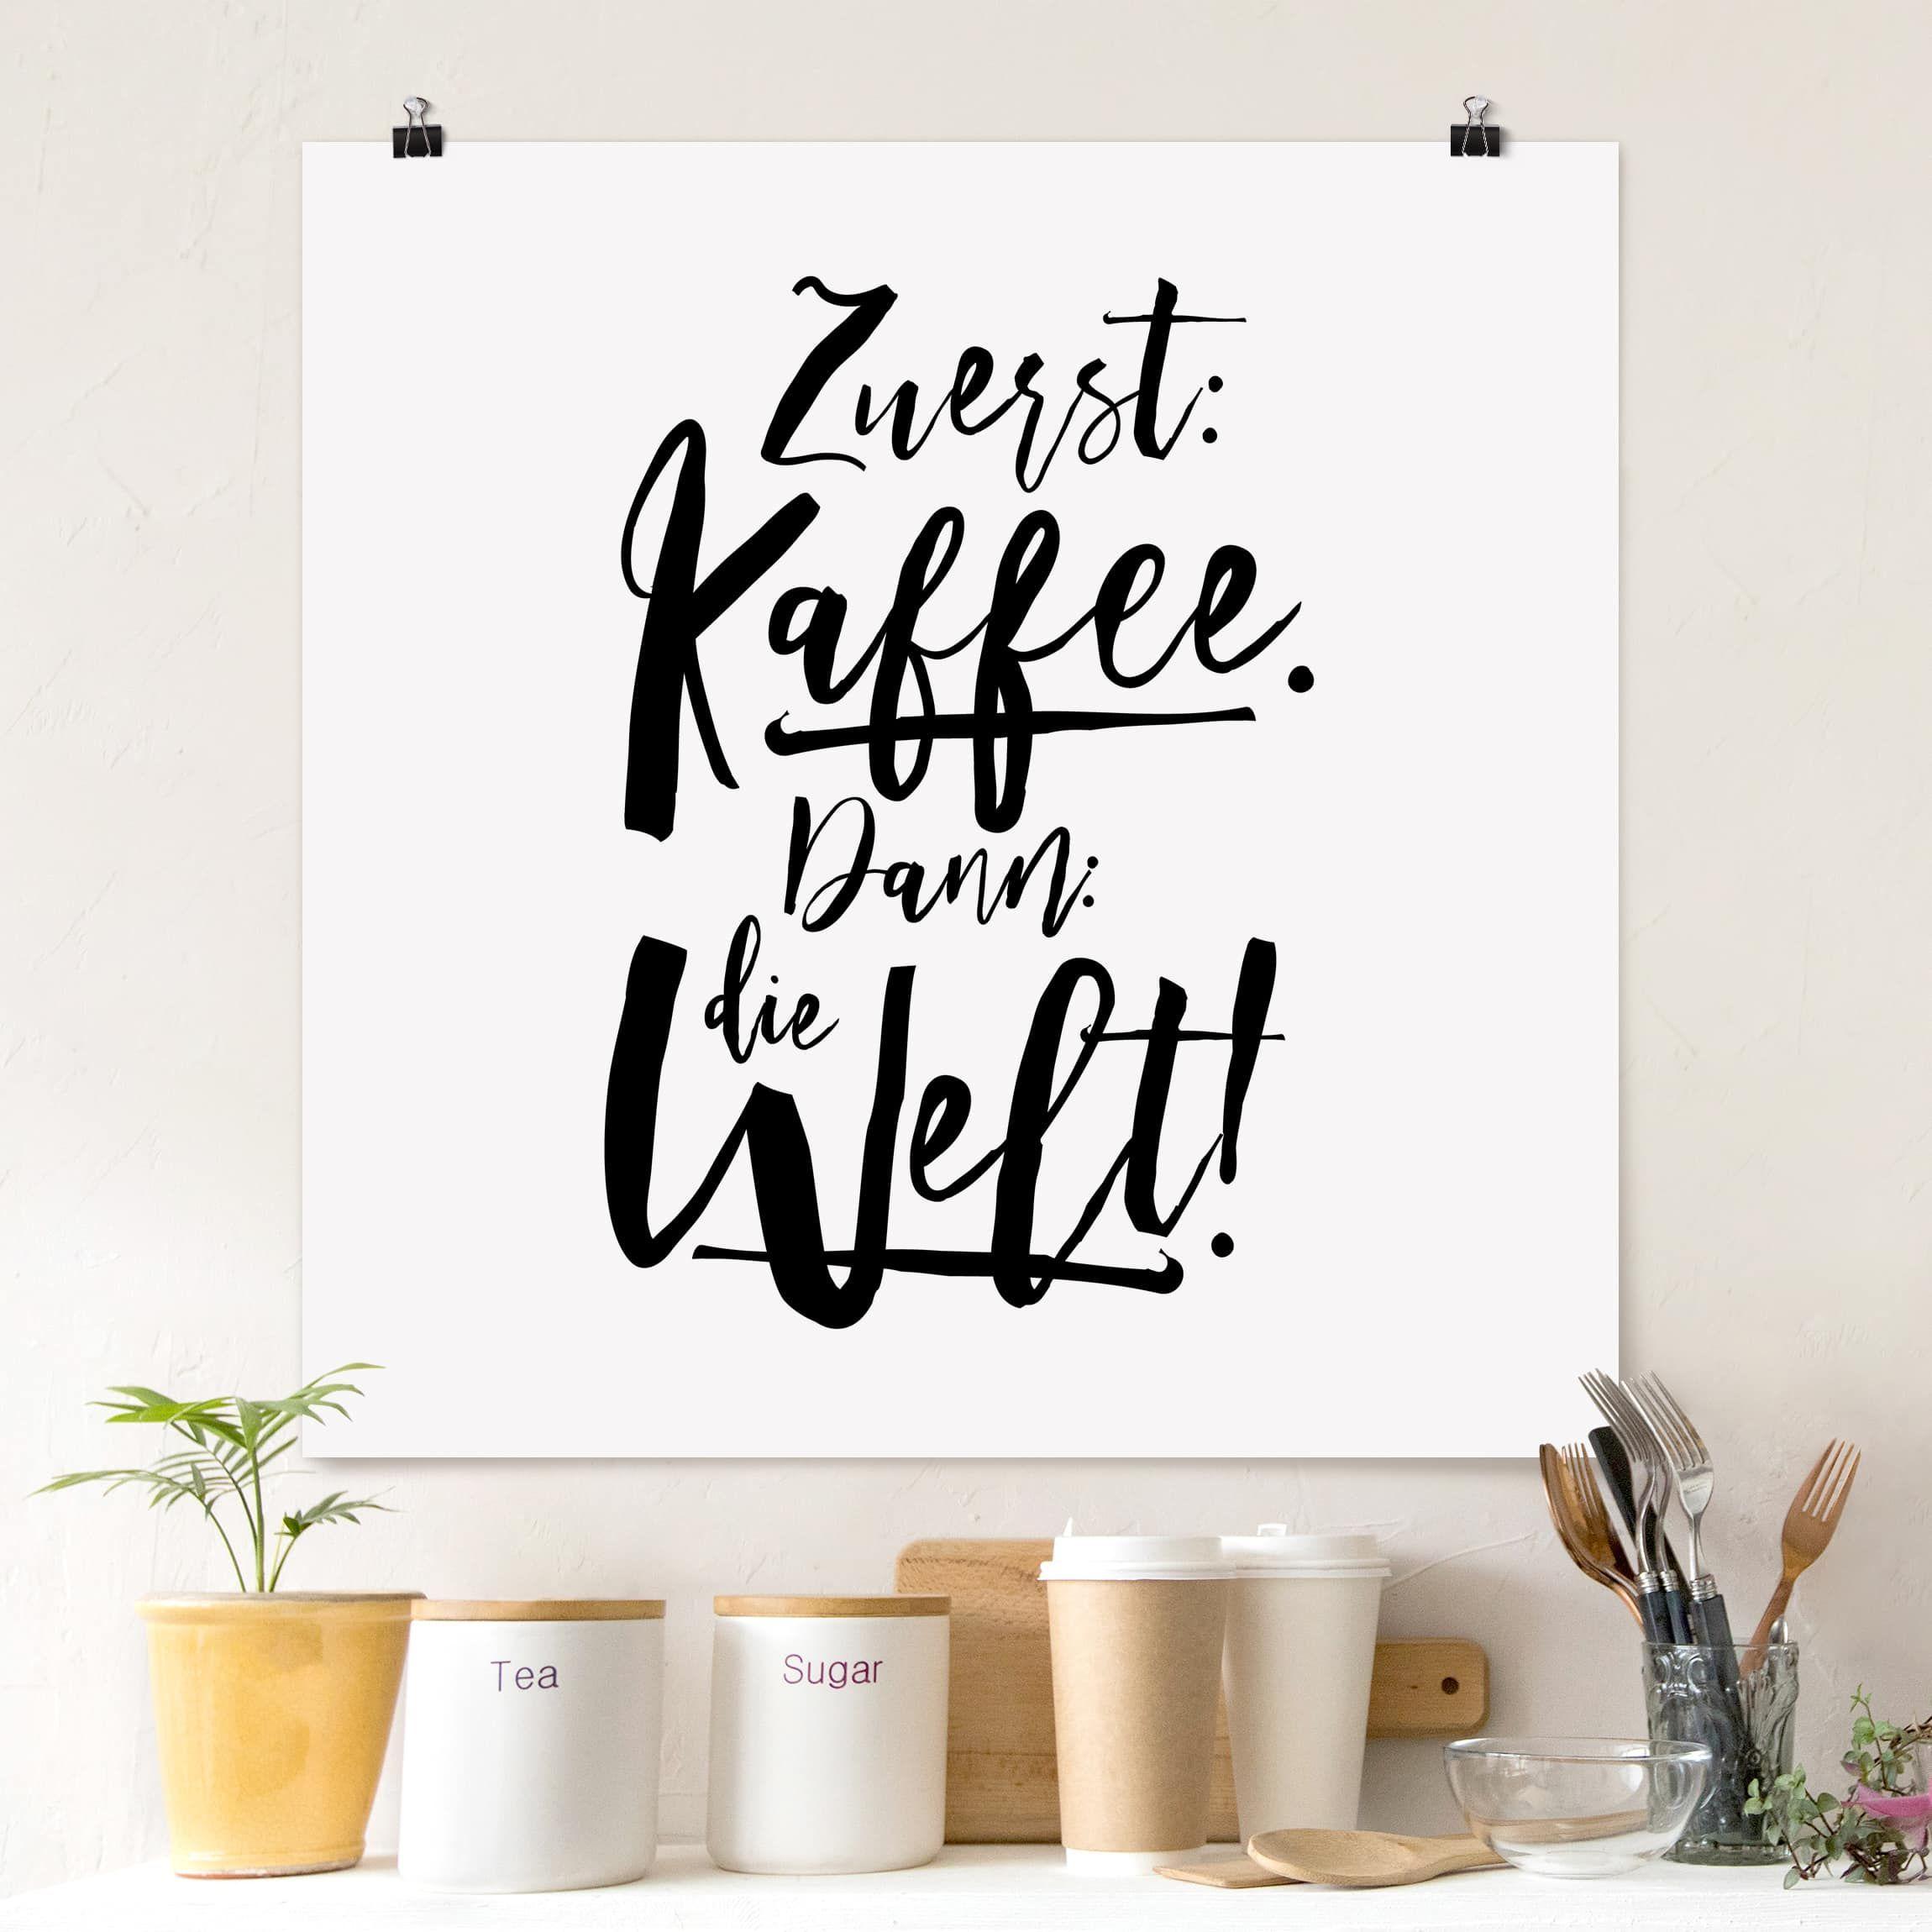 Poster Zuerst Kaffee Dann Die Welt Quadrat 1 1 In 2020 Posterdrucke Kaffee Poster Poster